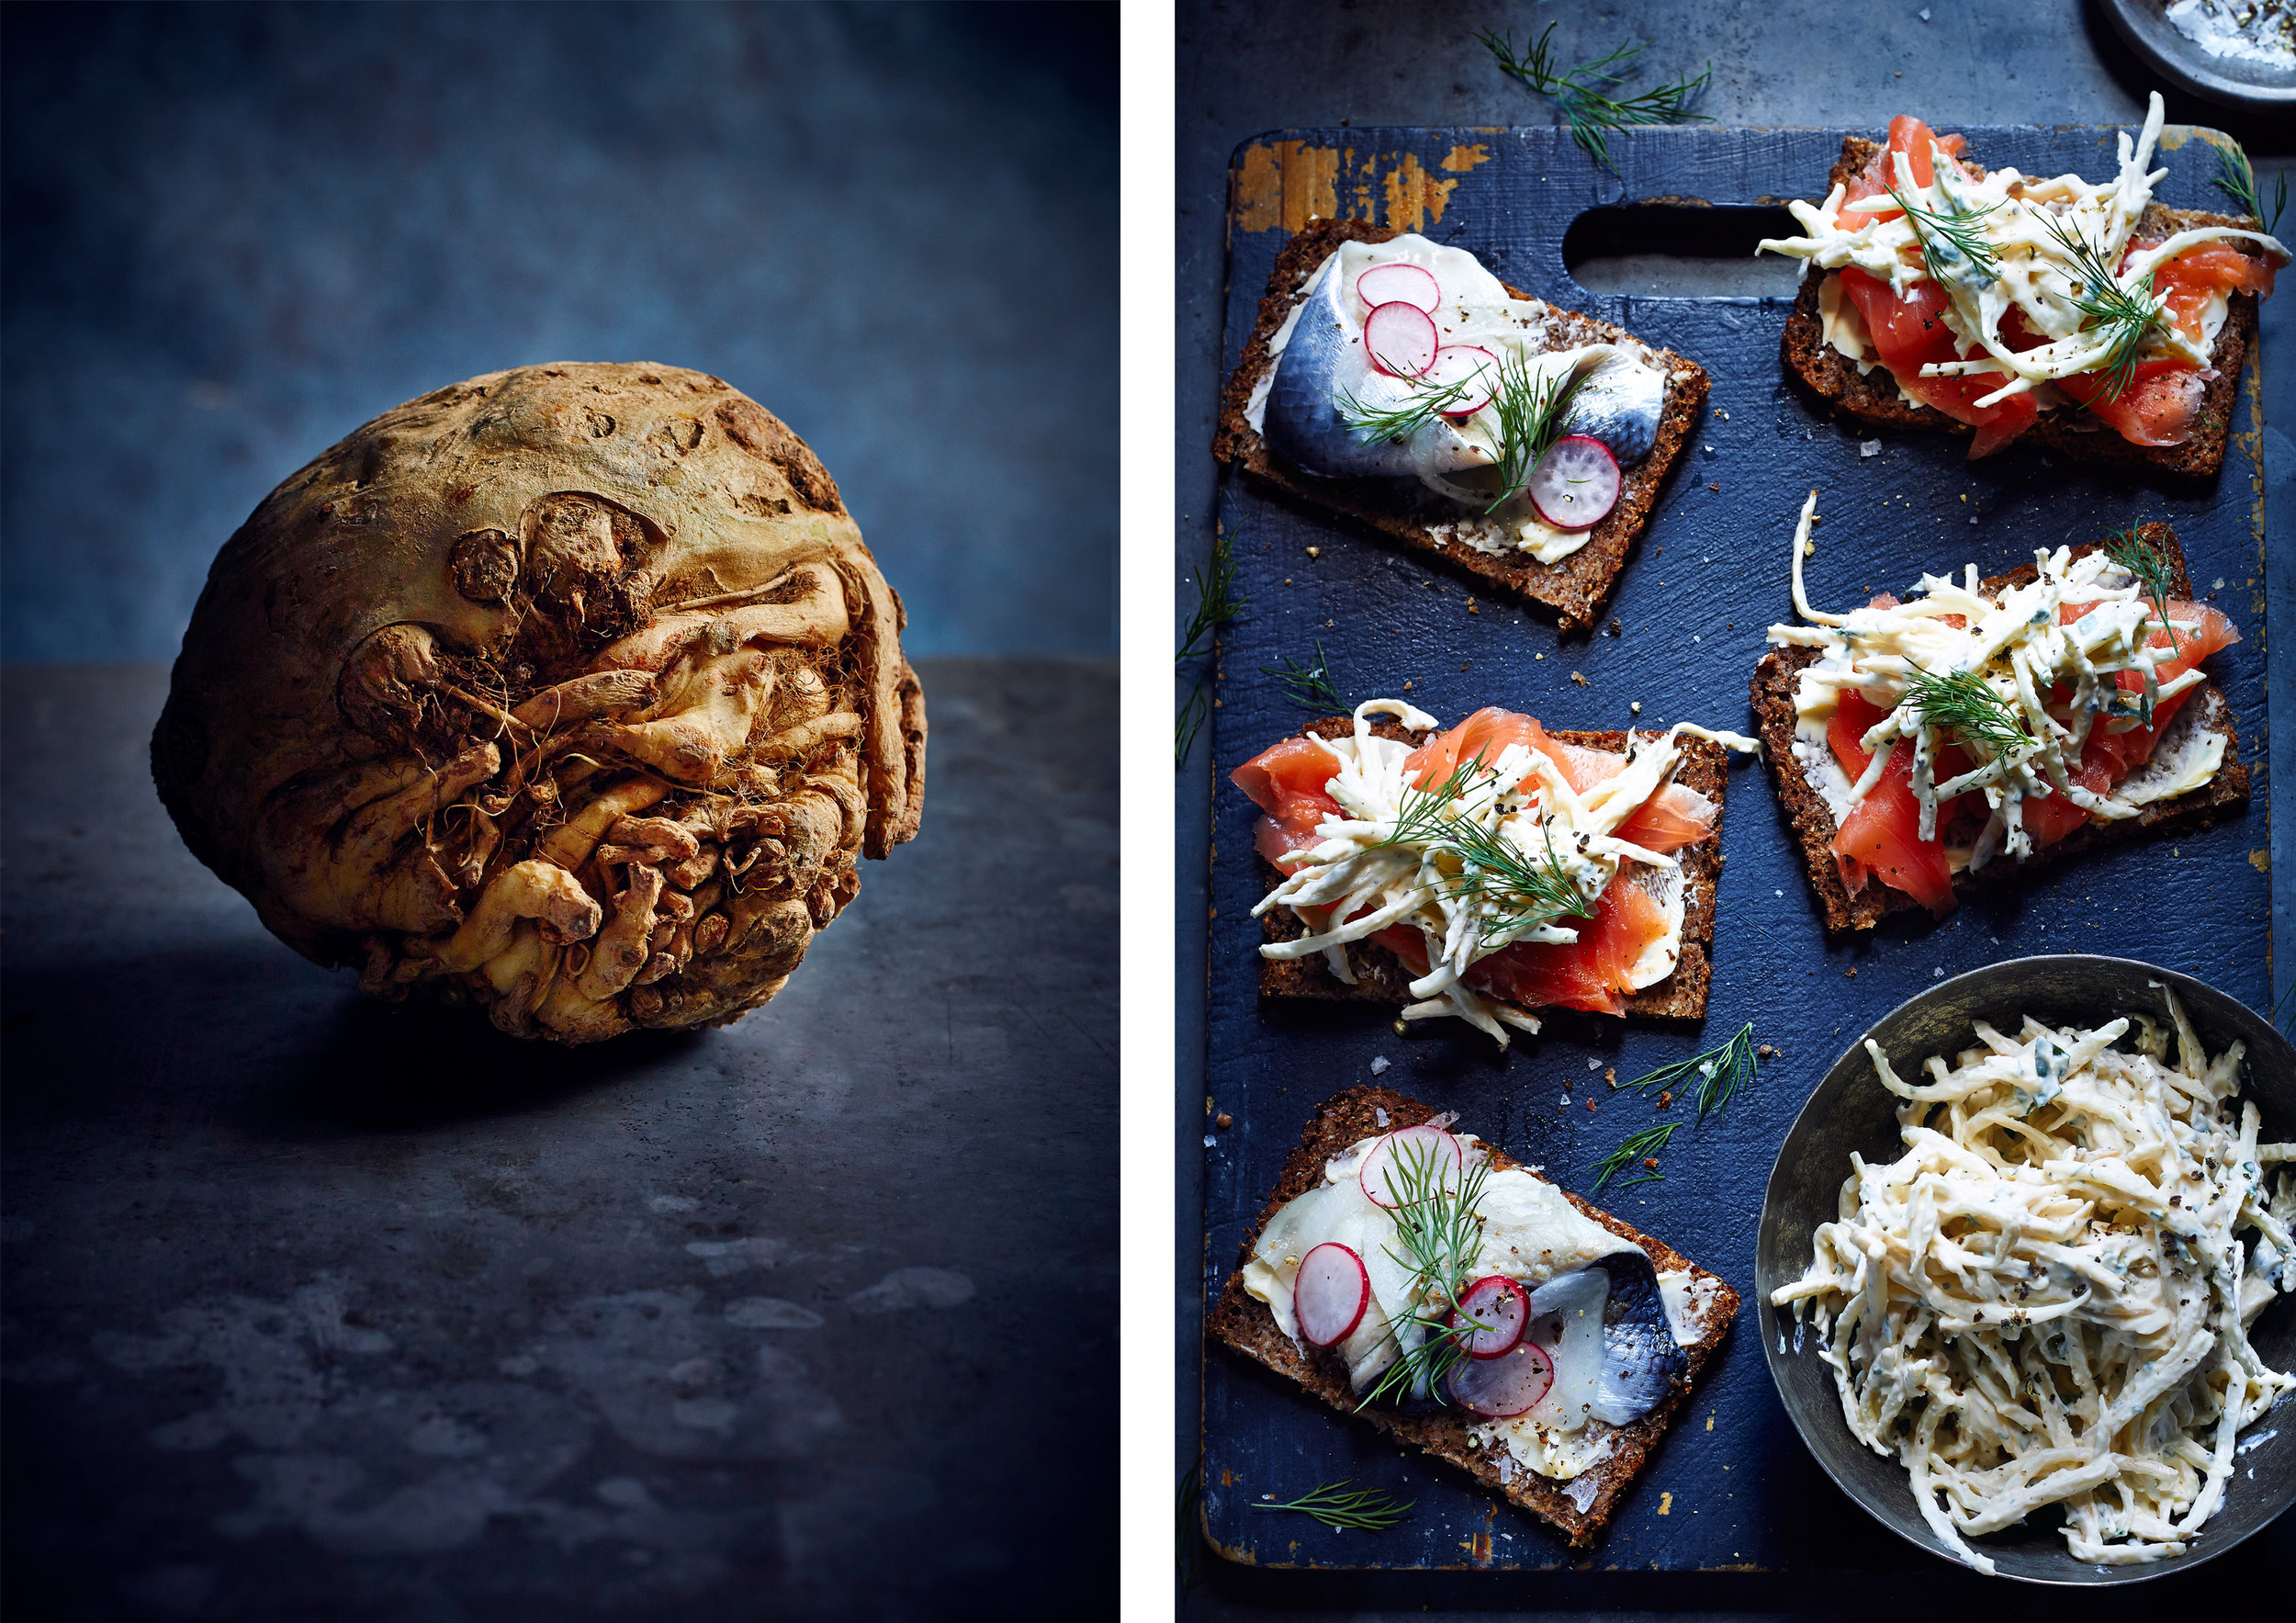 Food Stylist: Amy Stephenson Prop Stylist: Myself